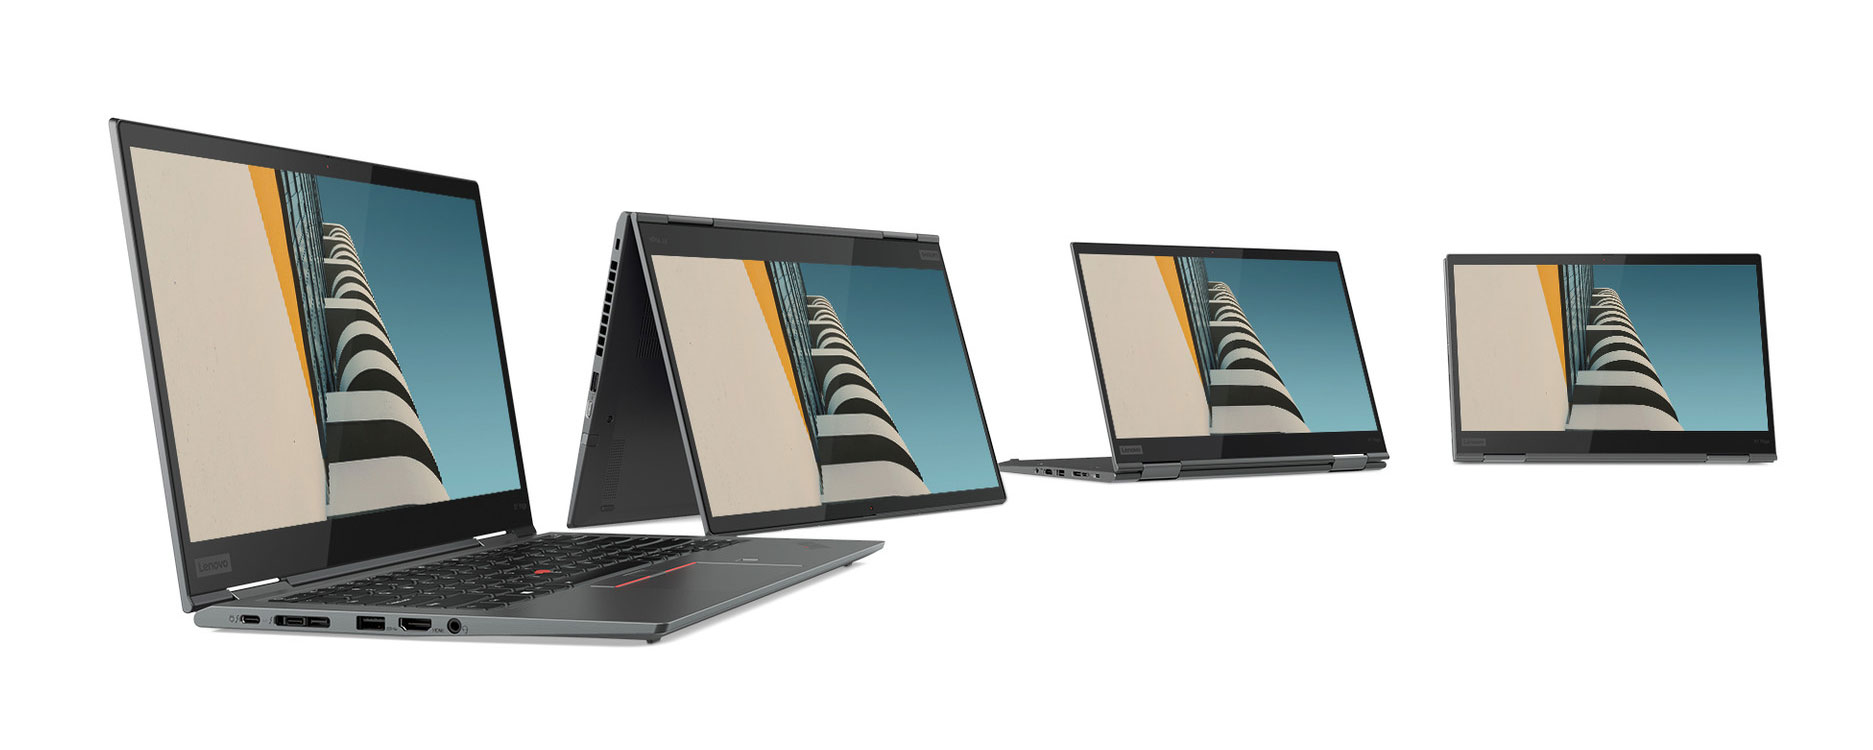 2019 premium Lenovo ThinkPads: X1 Carbon 7th-gen, X1 Yoga 4th-gen